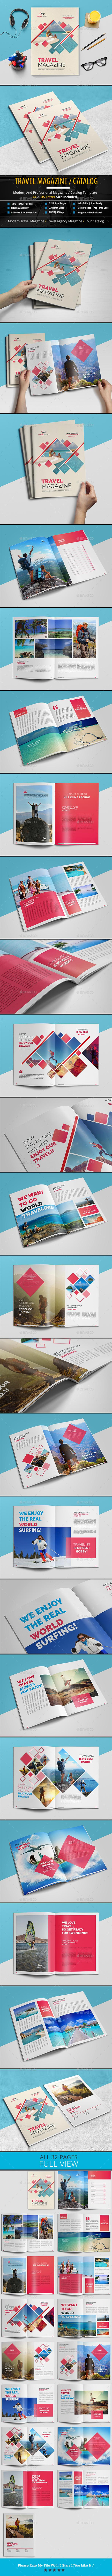 Travel Magazine | Catalog - Magazines Print Templates